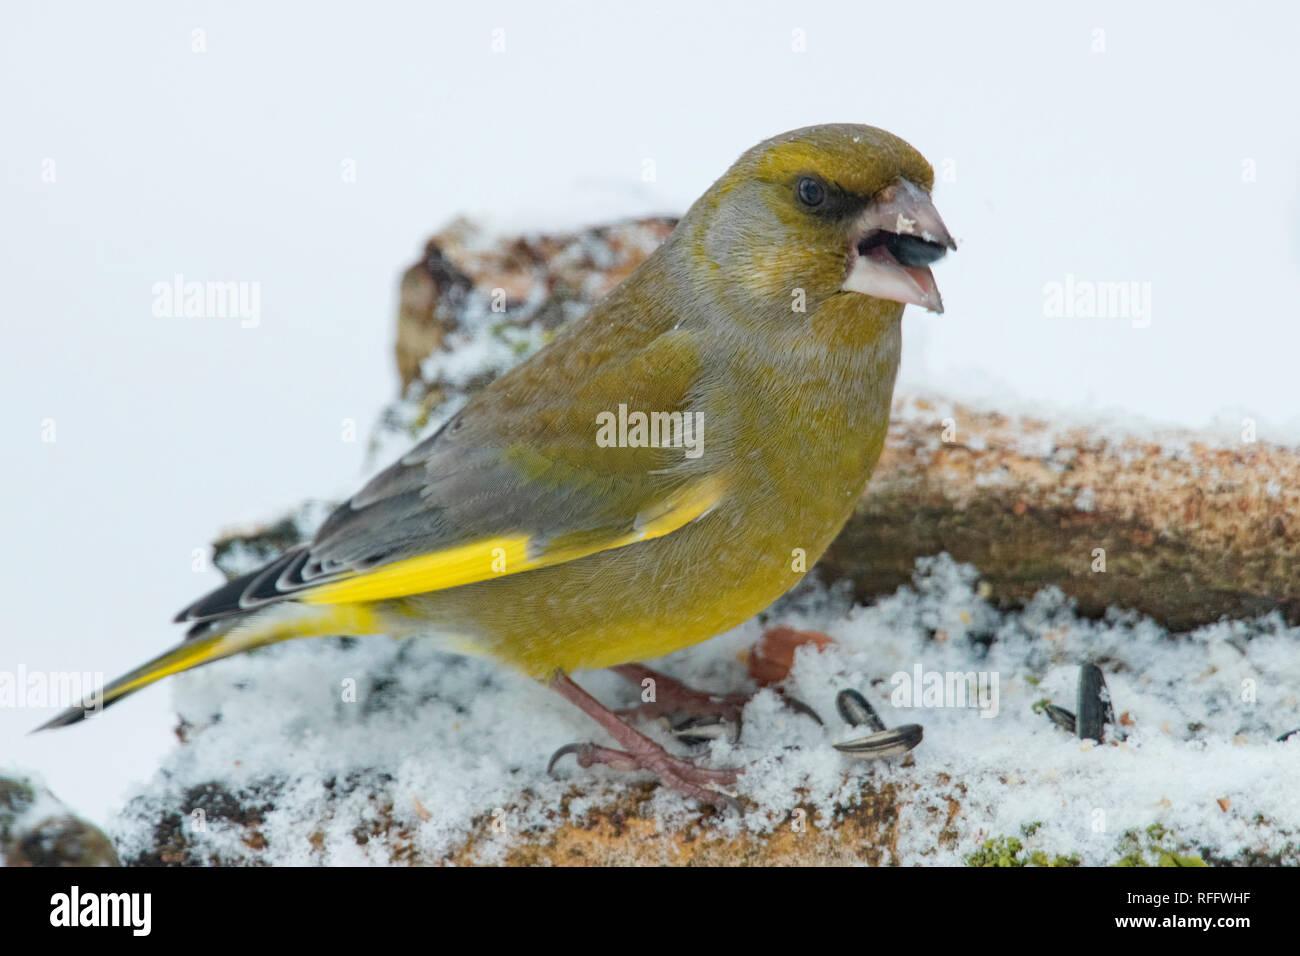 european greenfinch, (Chloris chloris) - Stock Image